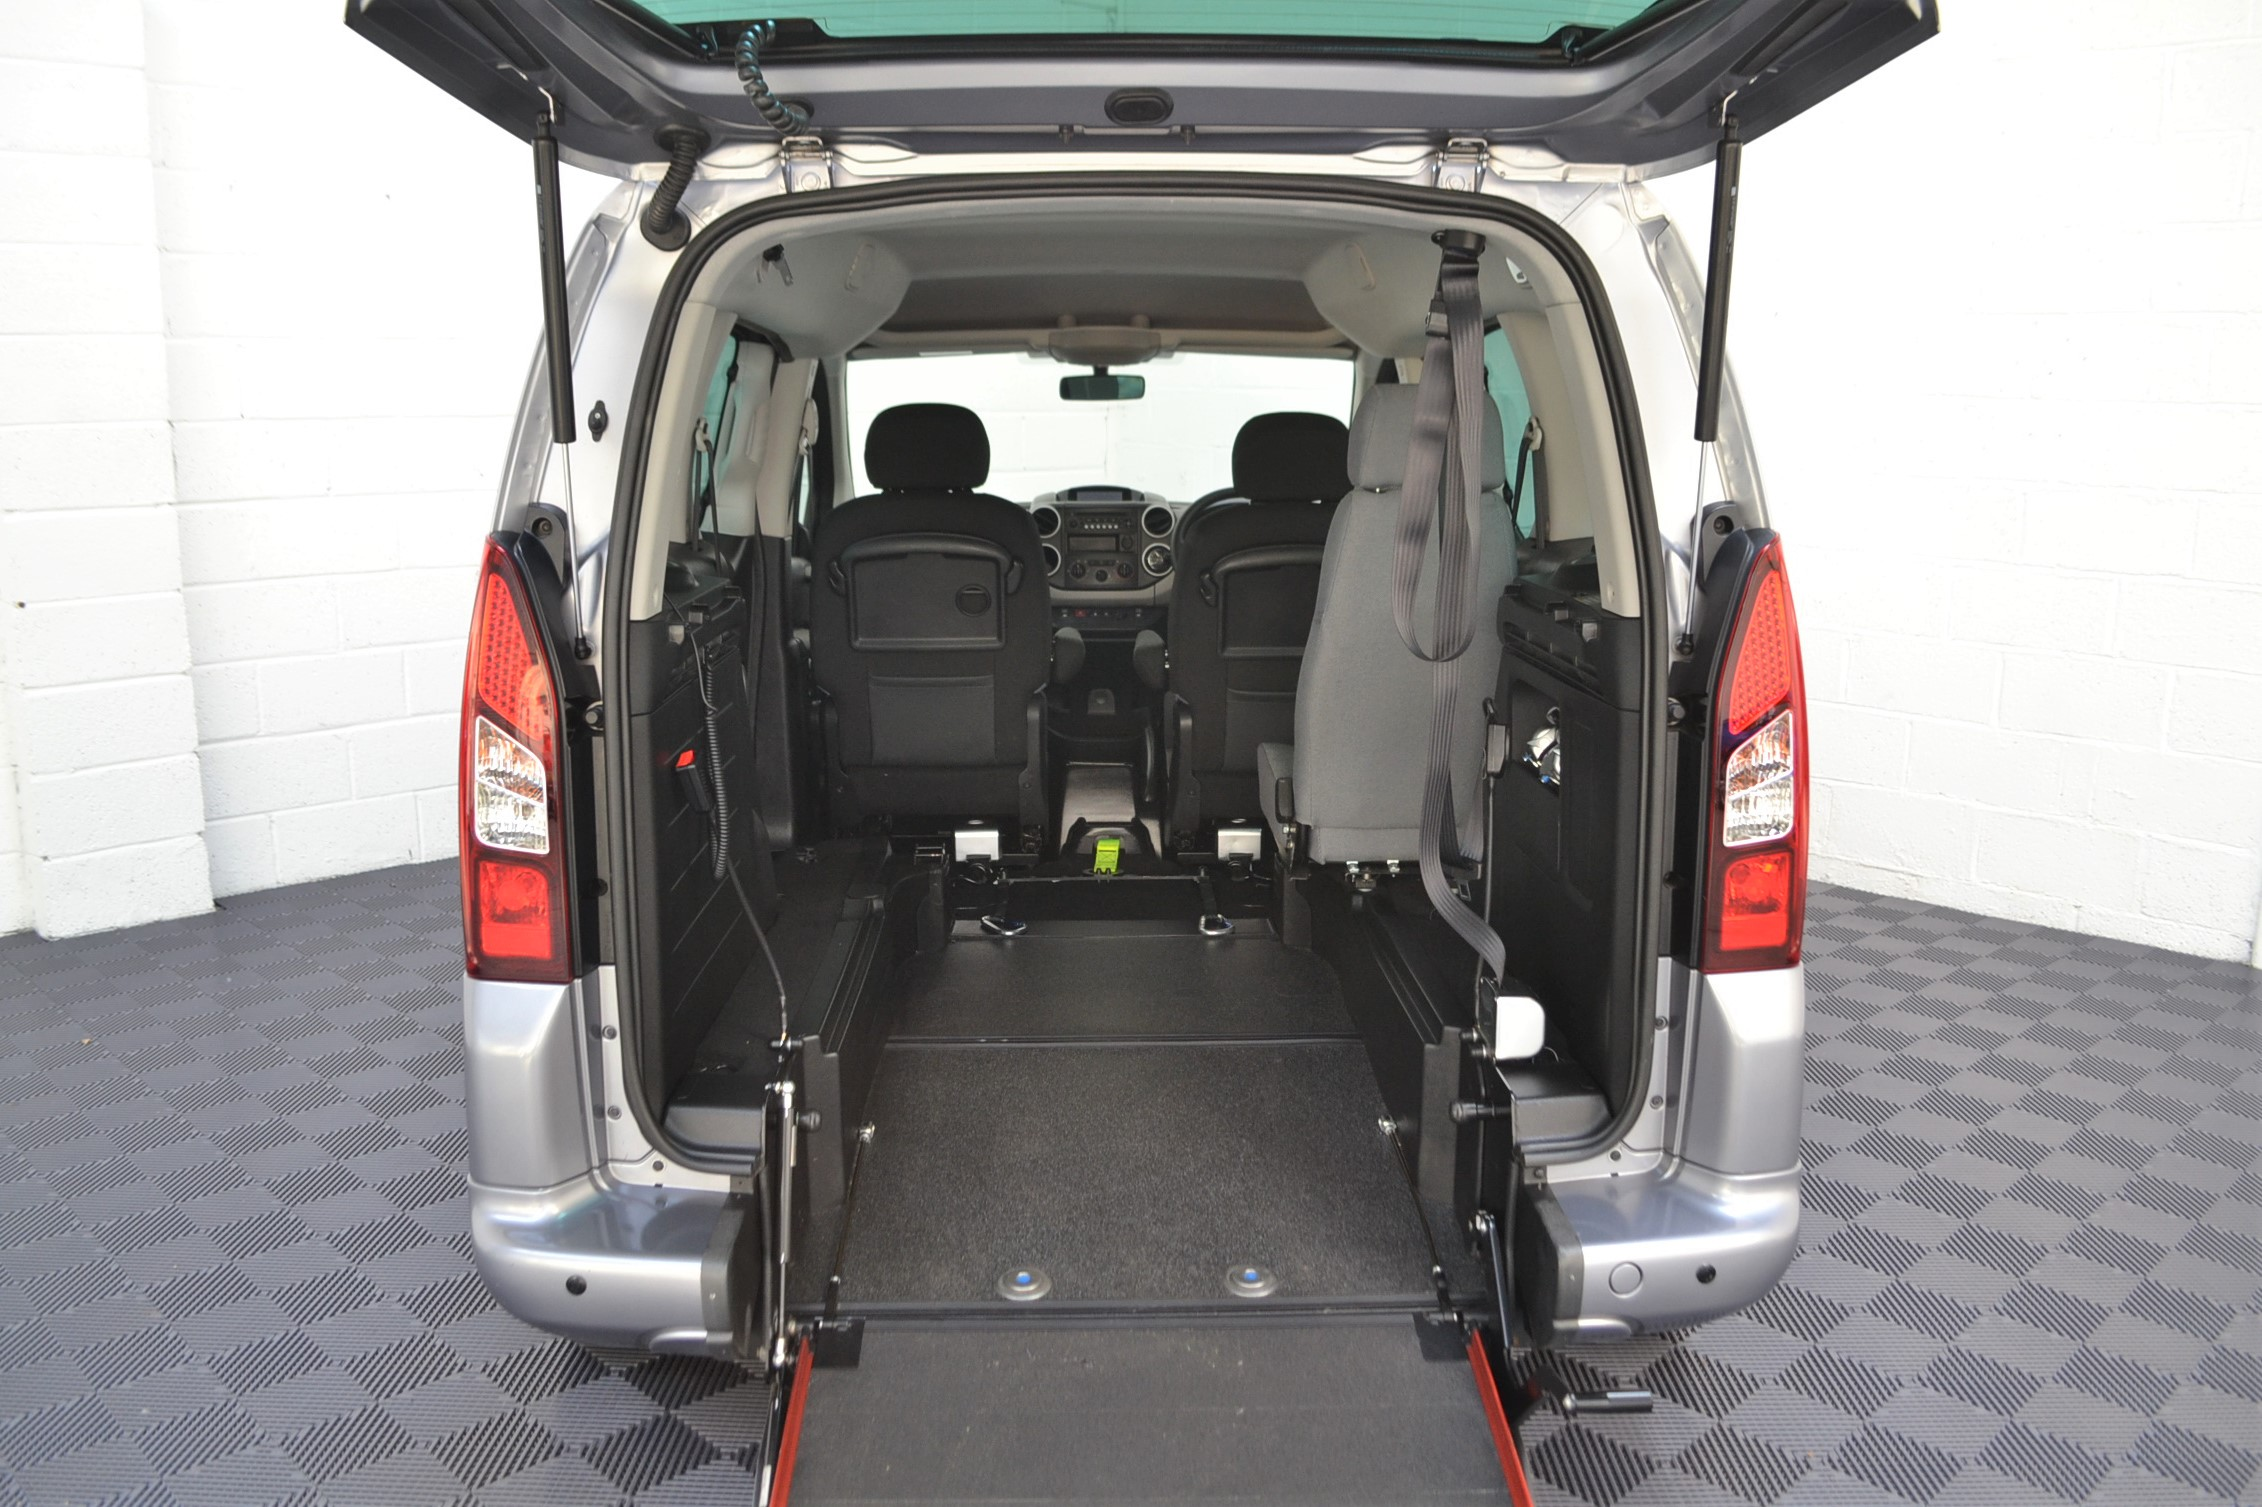 WAV Cars For Sale Bristol Wheelchair Accessible Vehicles Used For Sale Somerset Devon Dorset Bath Peugeot Partner Auto 8